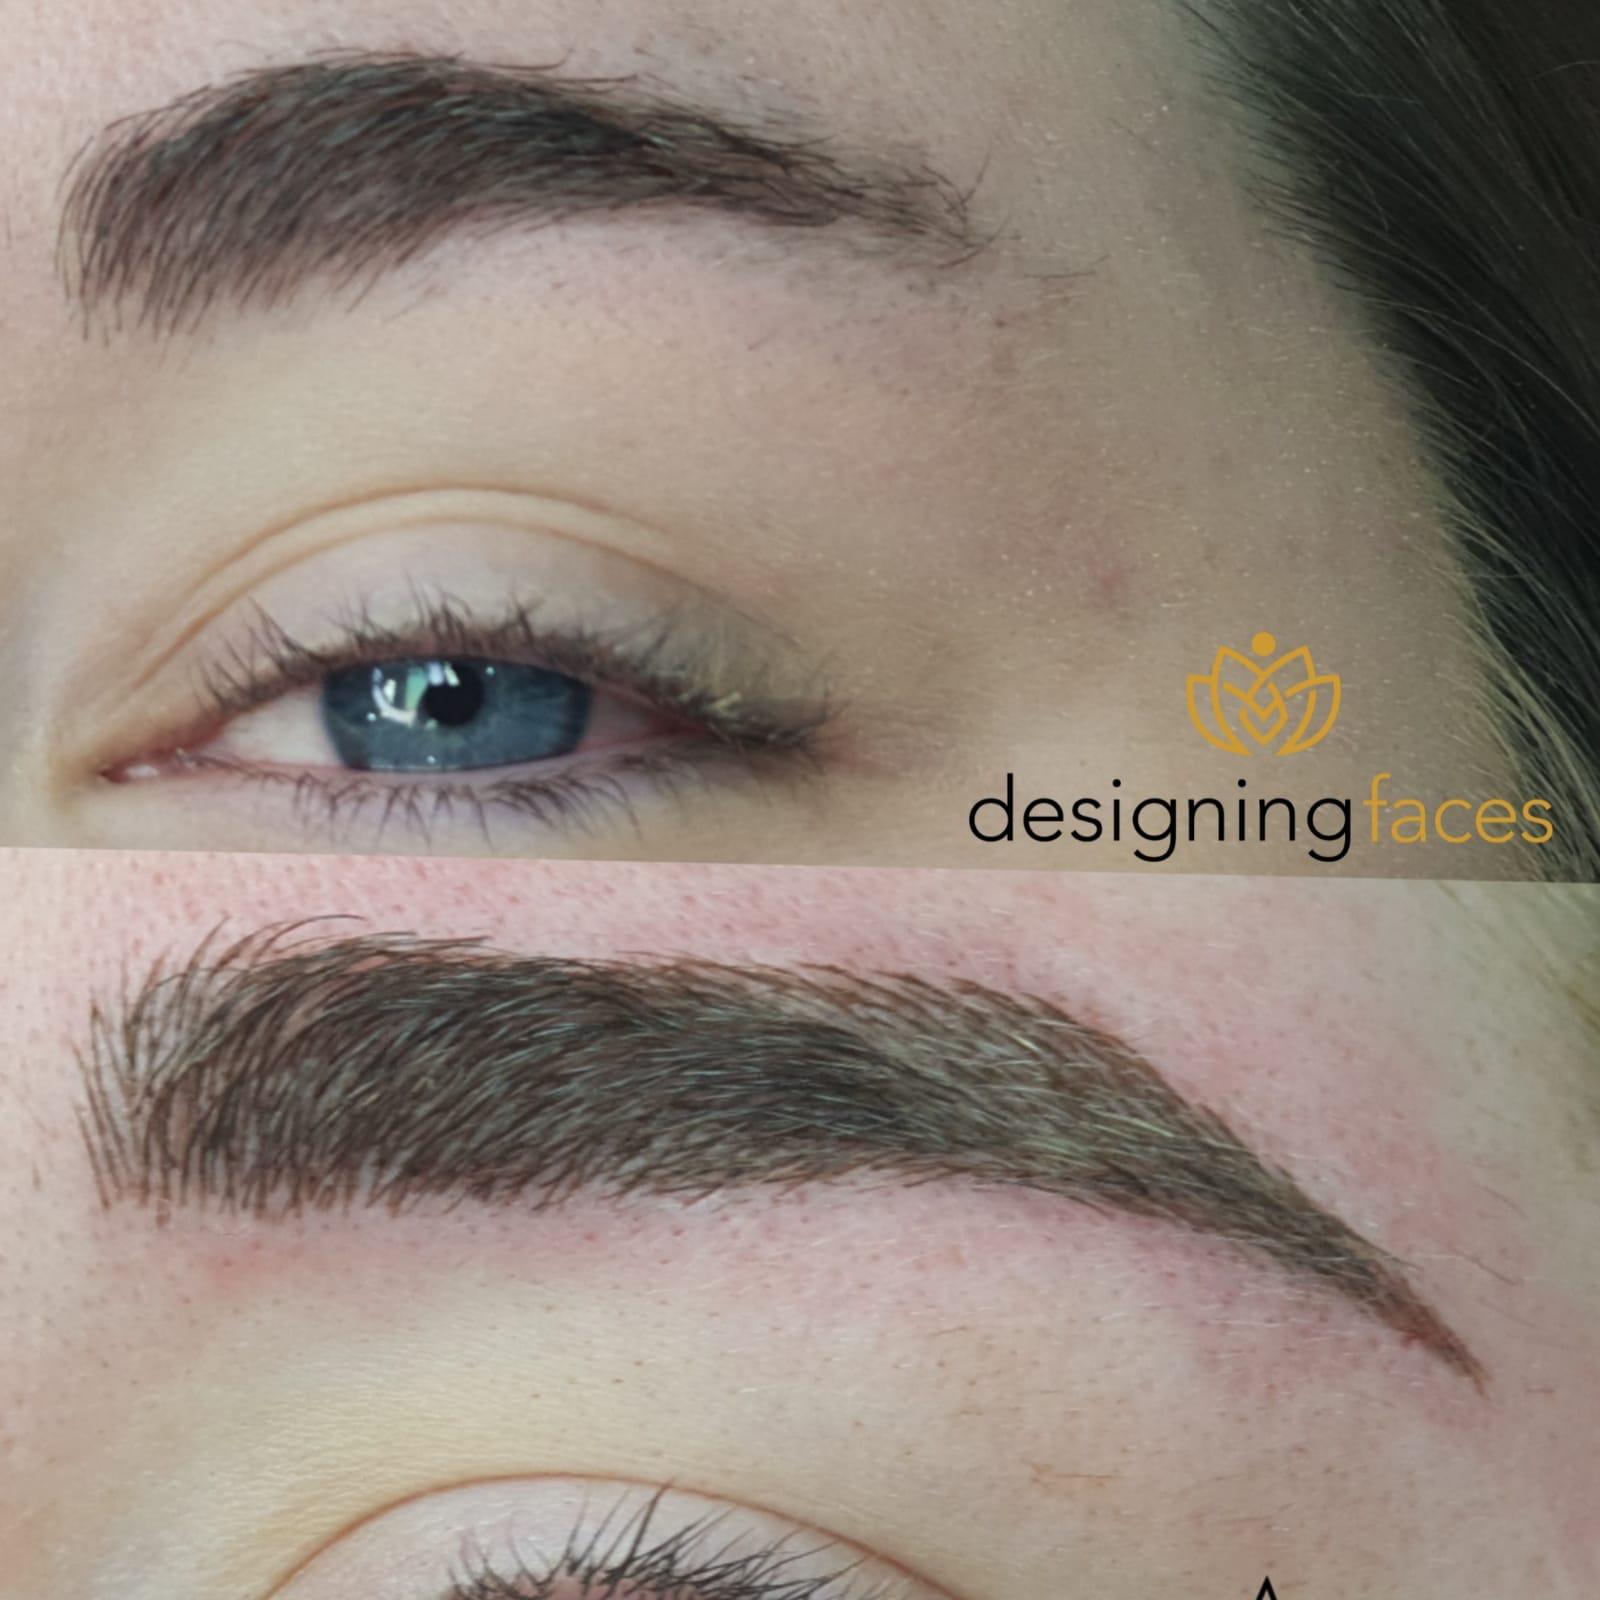 Eyebrow Microblading In Birmingham Solihull Eyebrow Tattoos